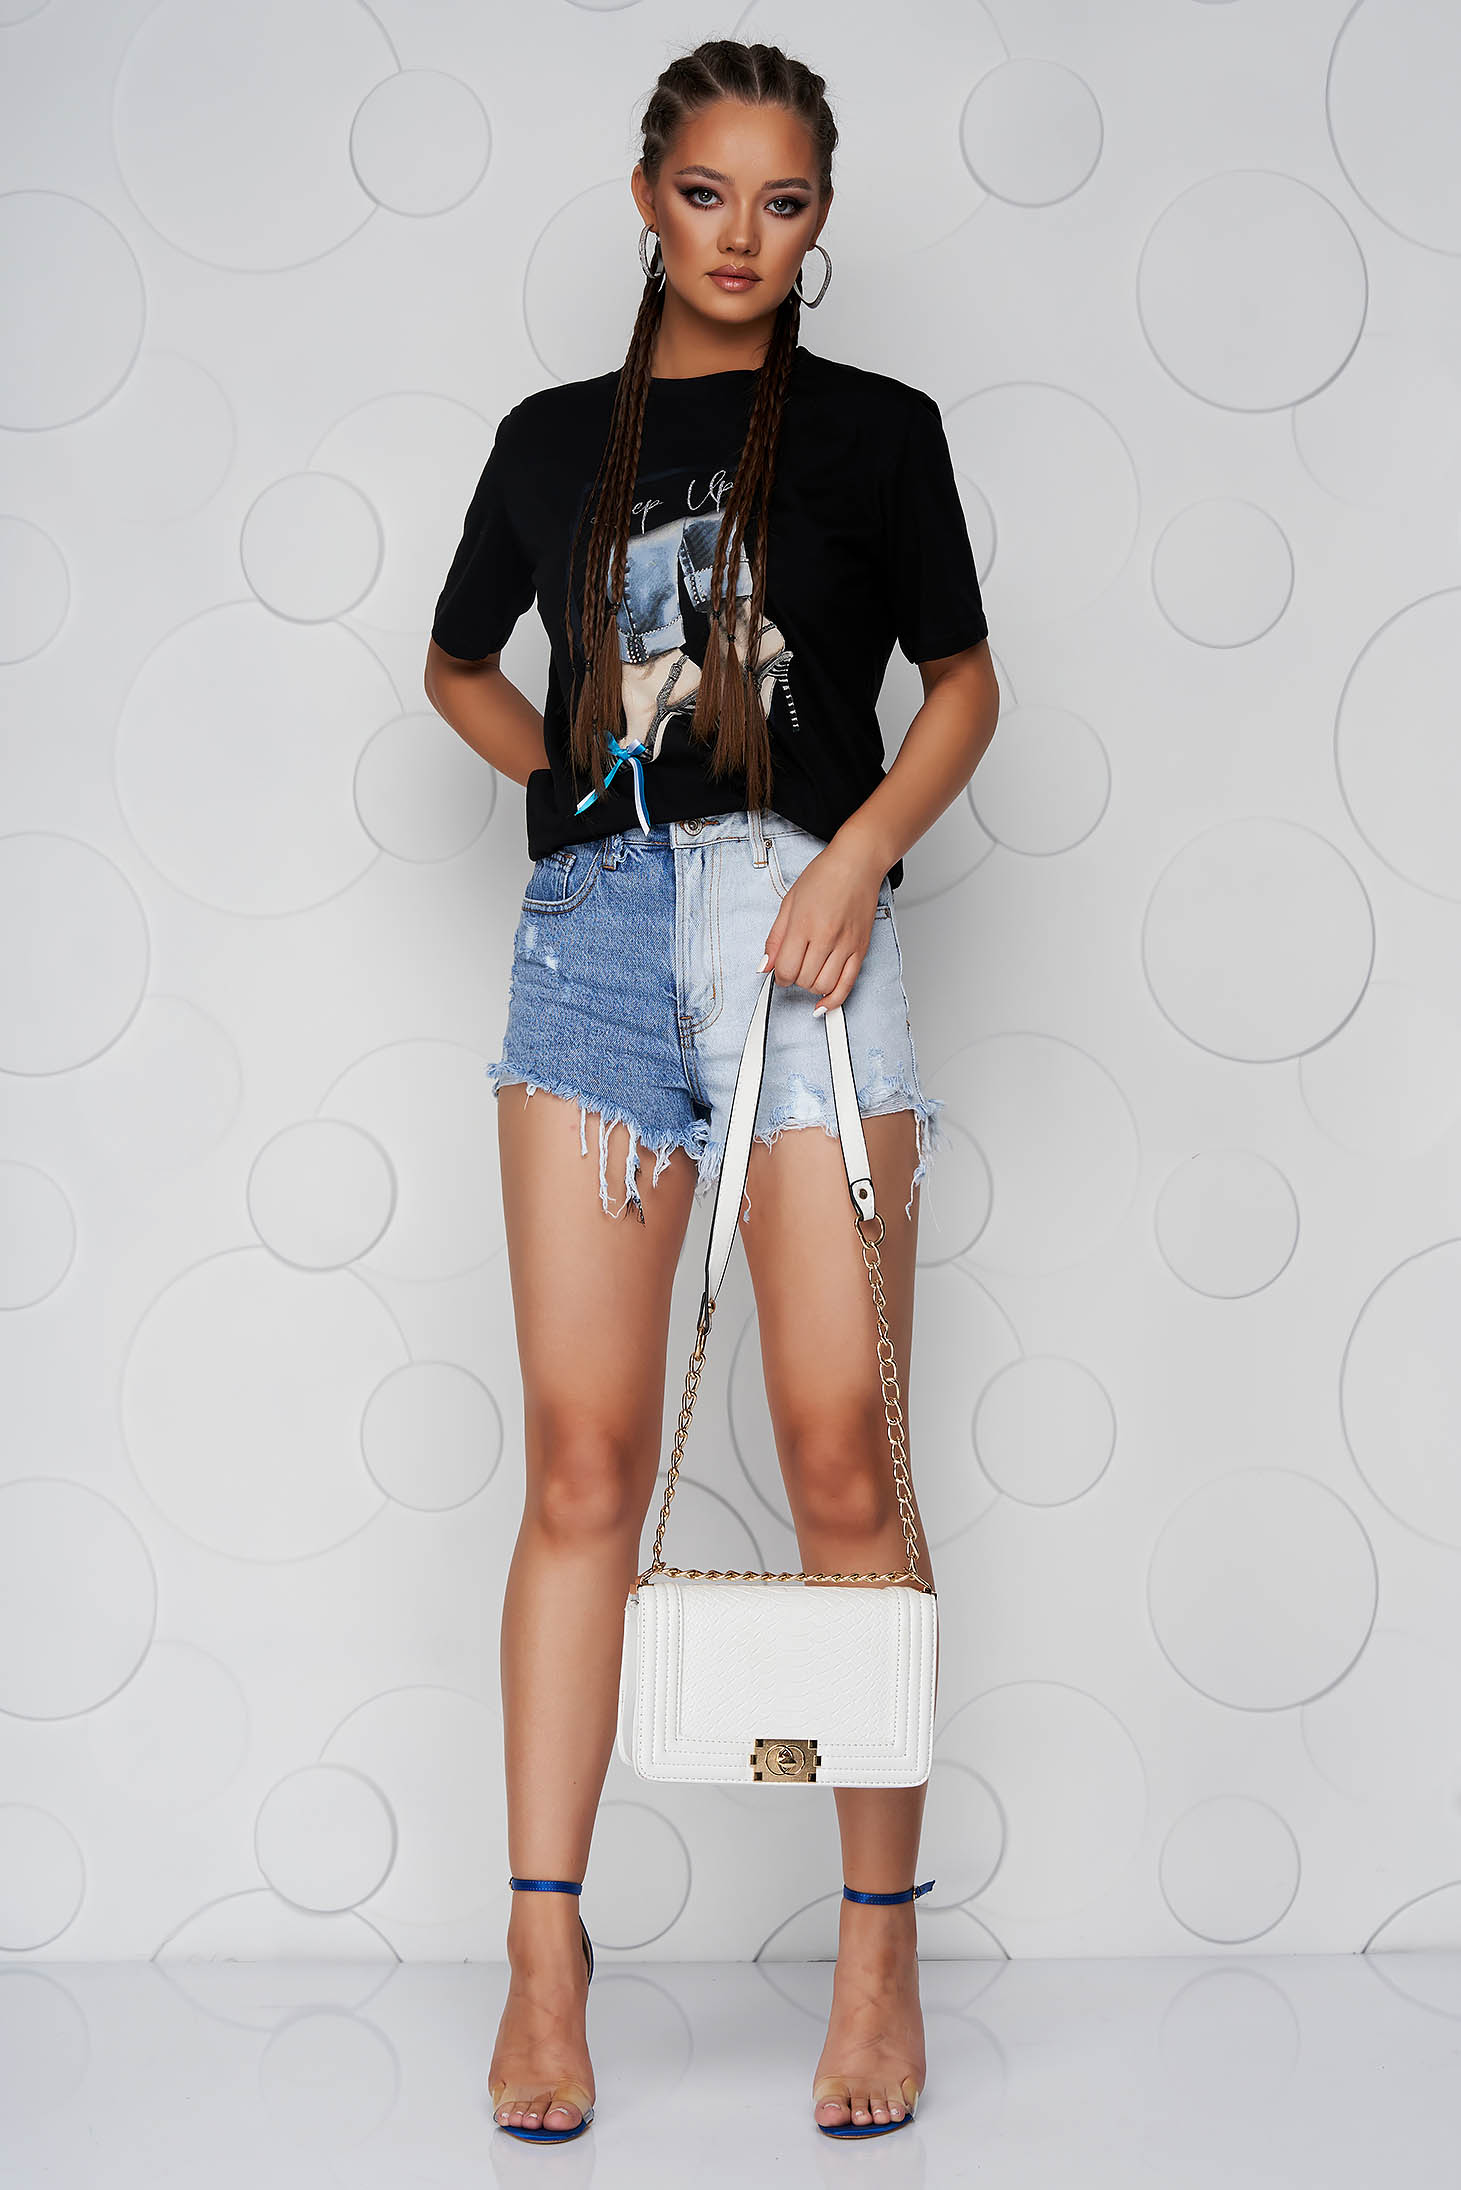 Tricou SunShine negru din bumbac cu croi larg si imprimeuri grafice